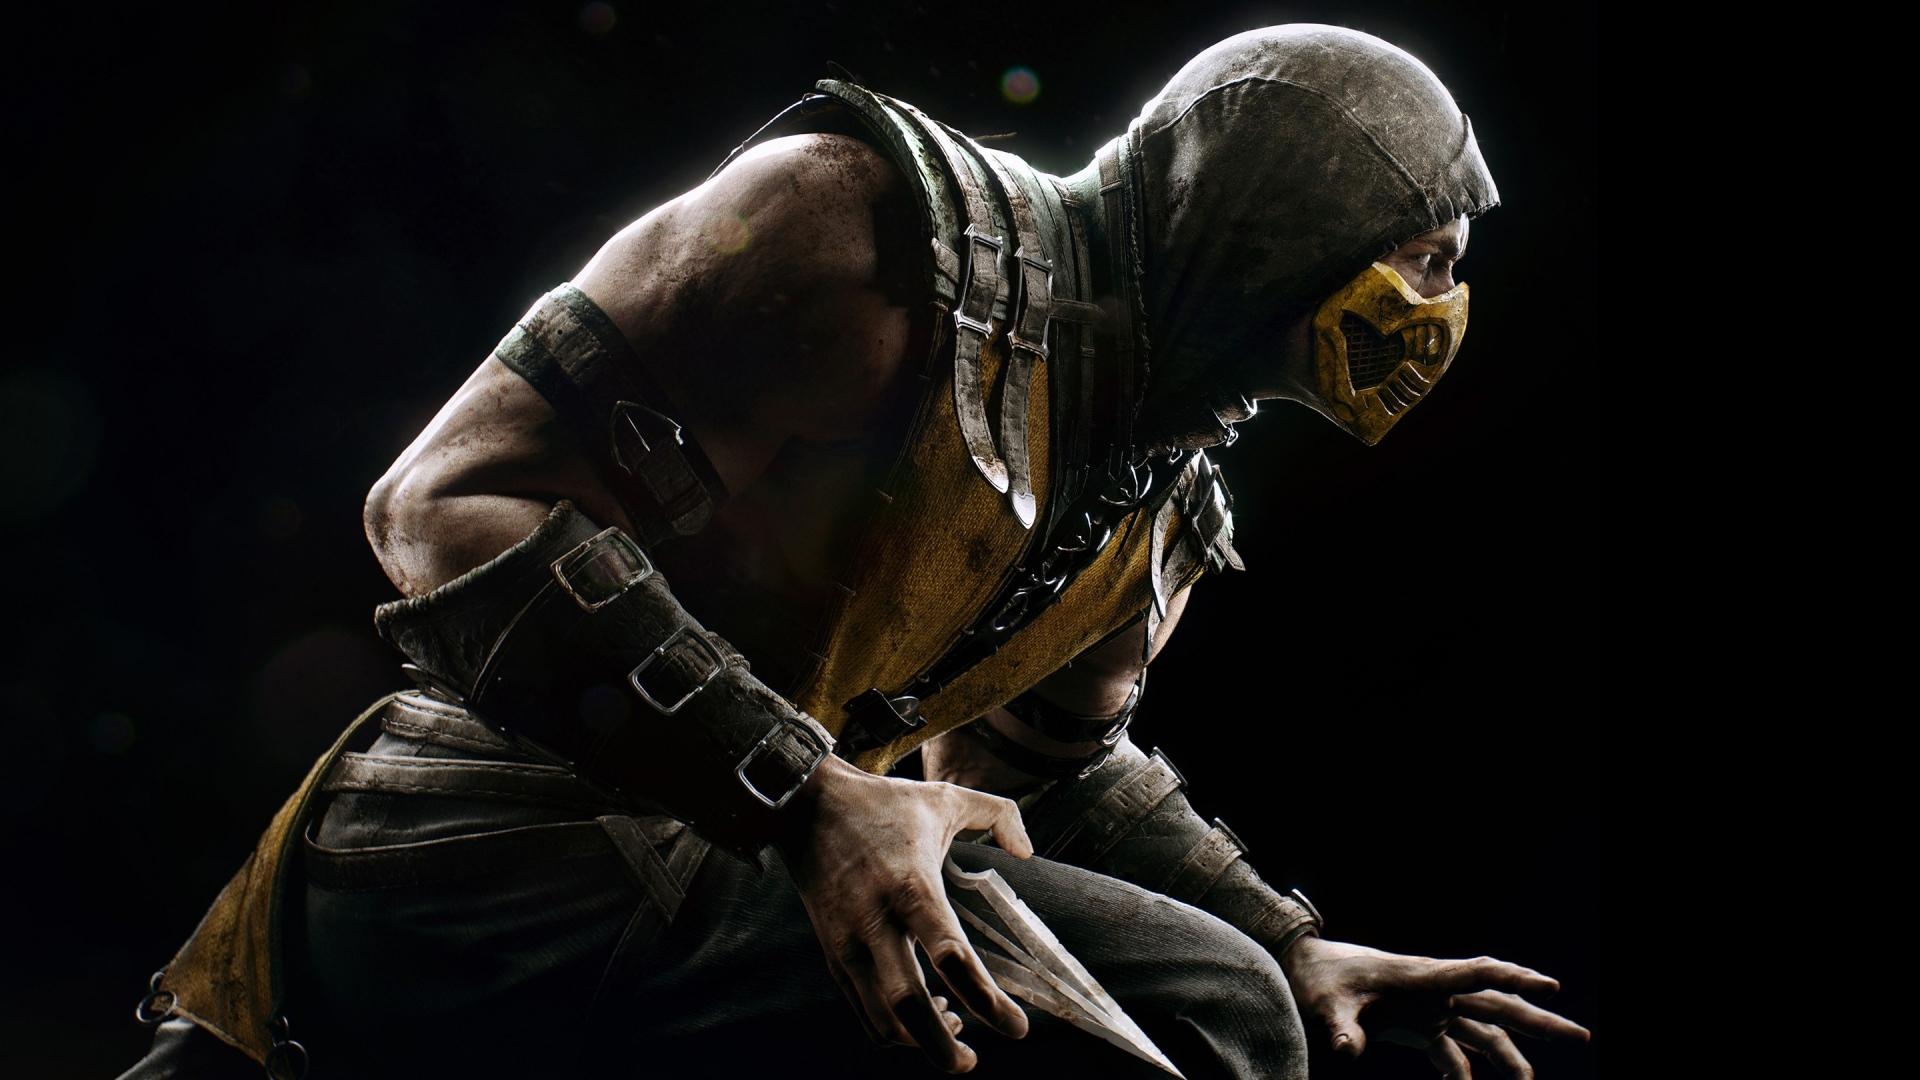 Mortal Kombat Scorpion Hero